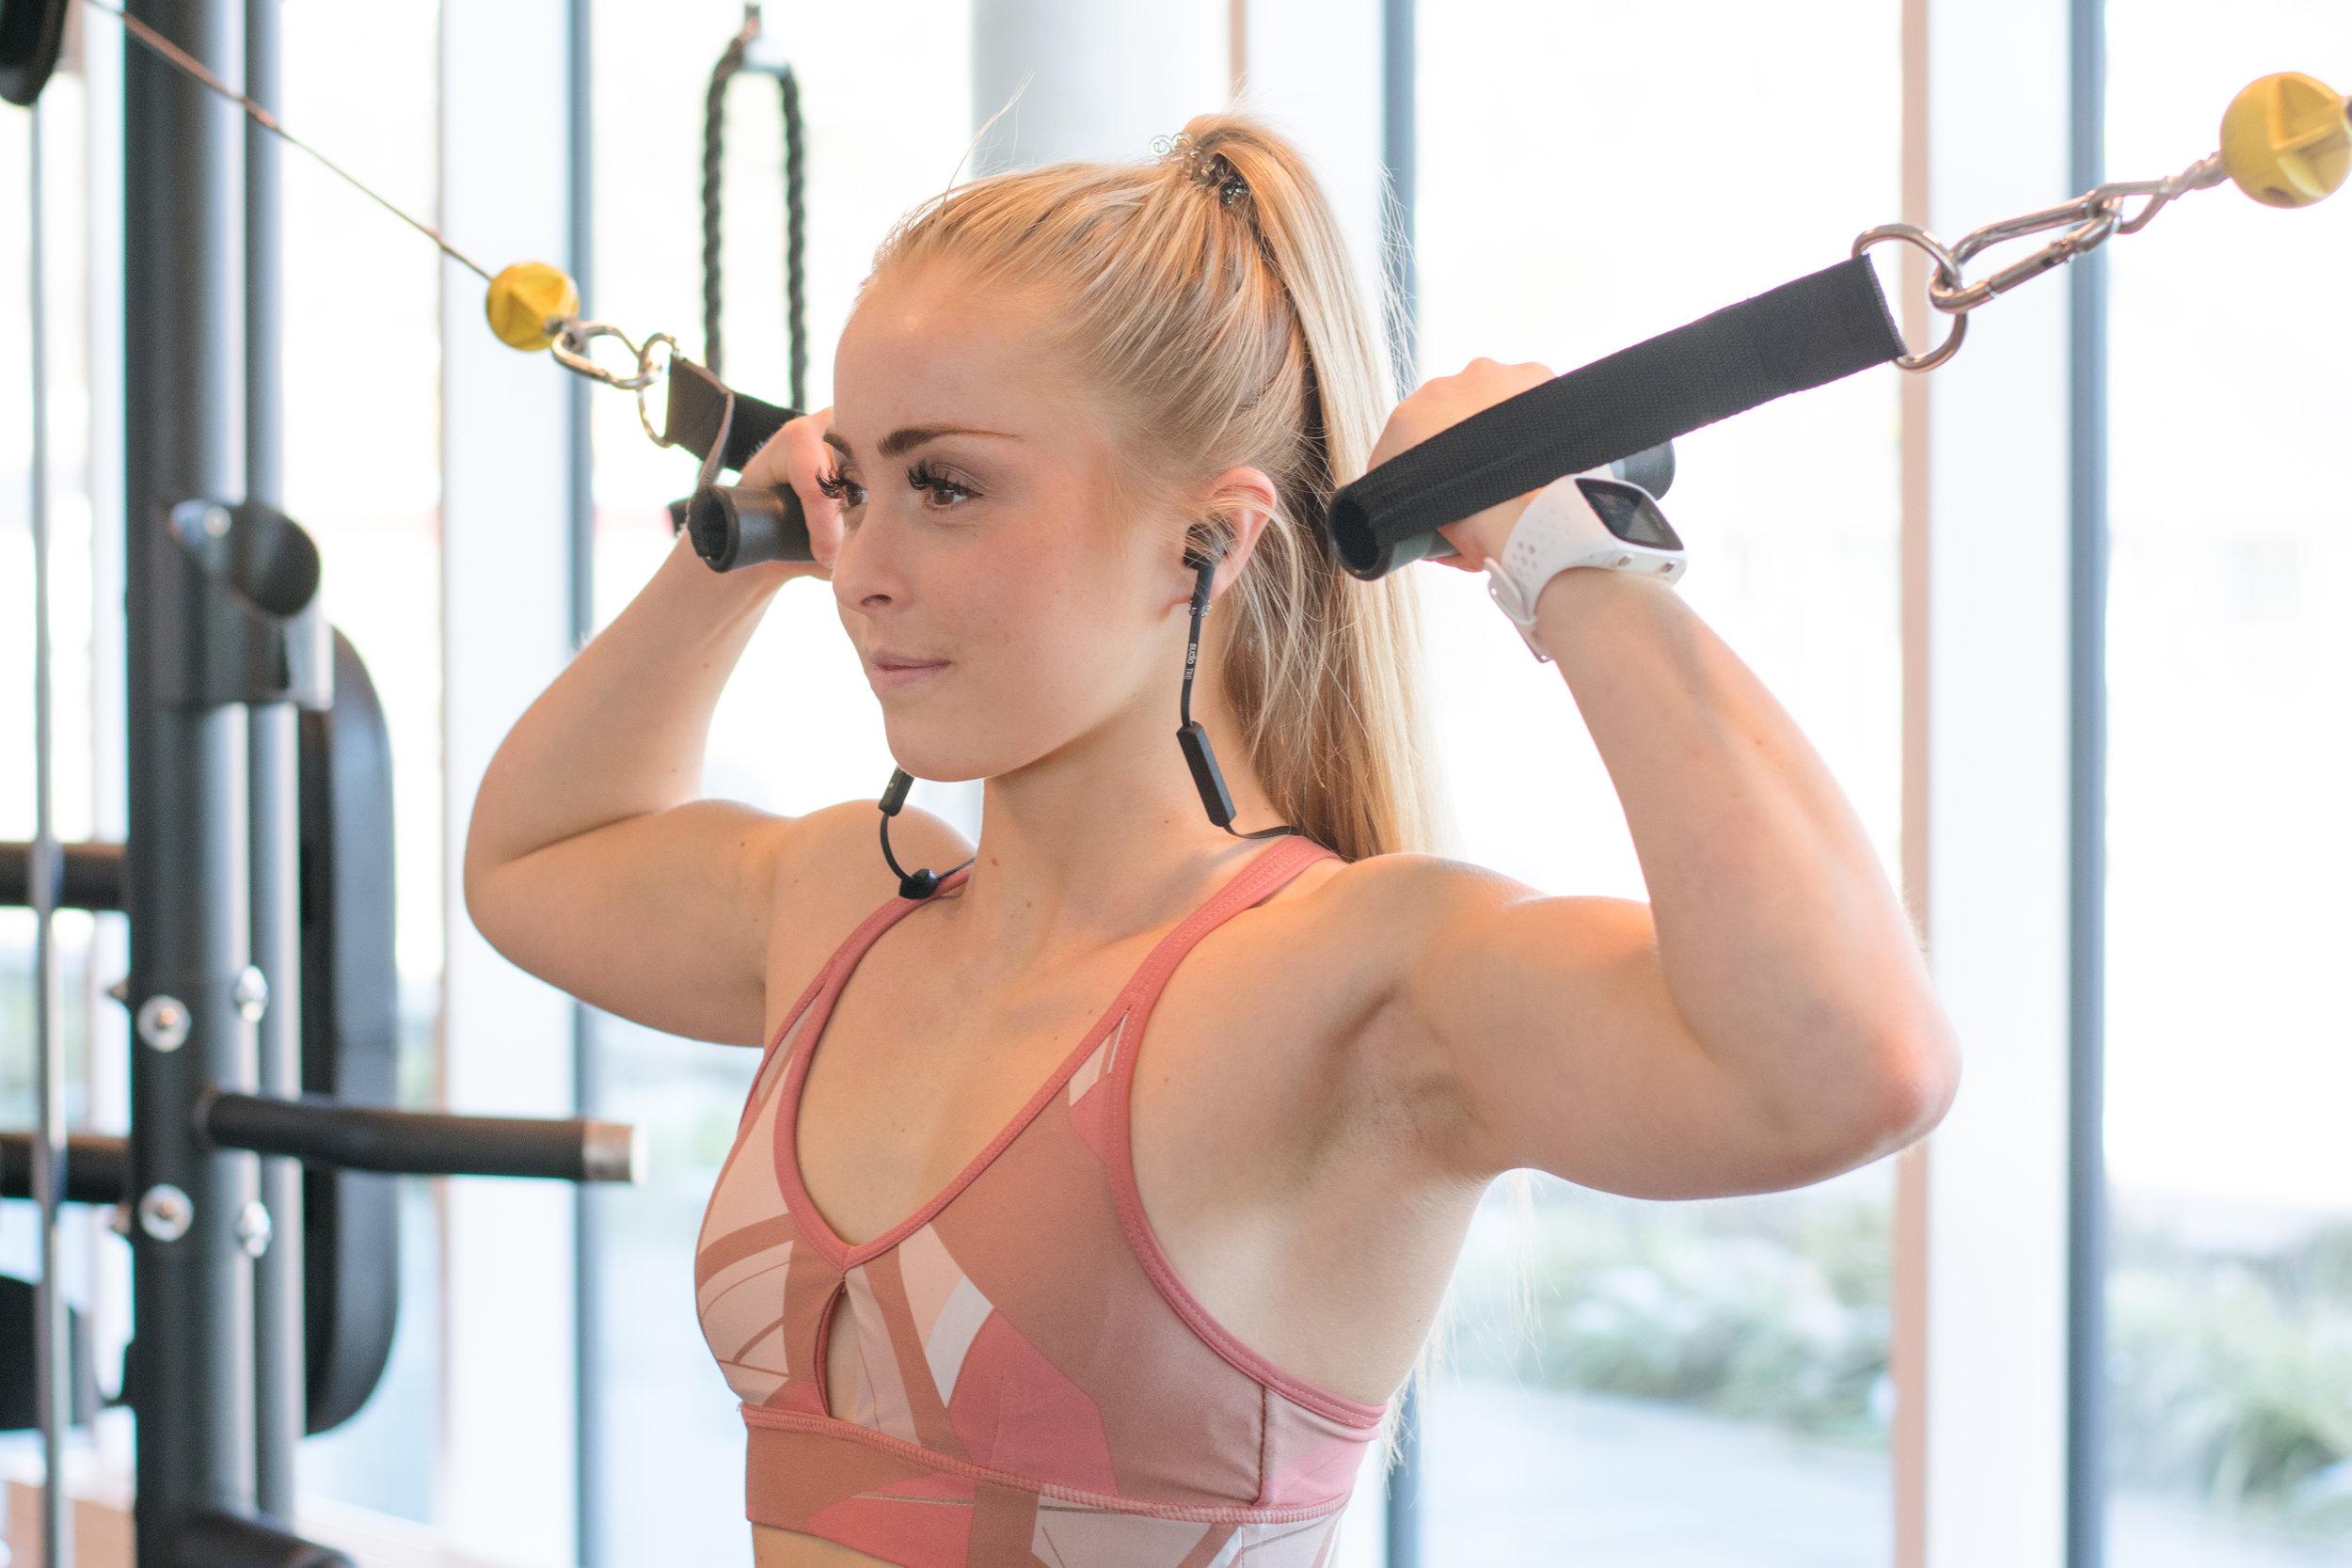 Wall Digital Group Gym fitness shoot